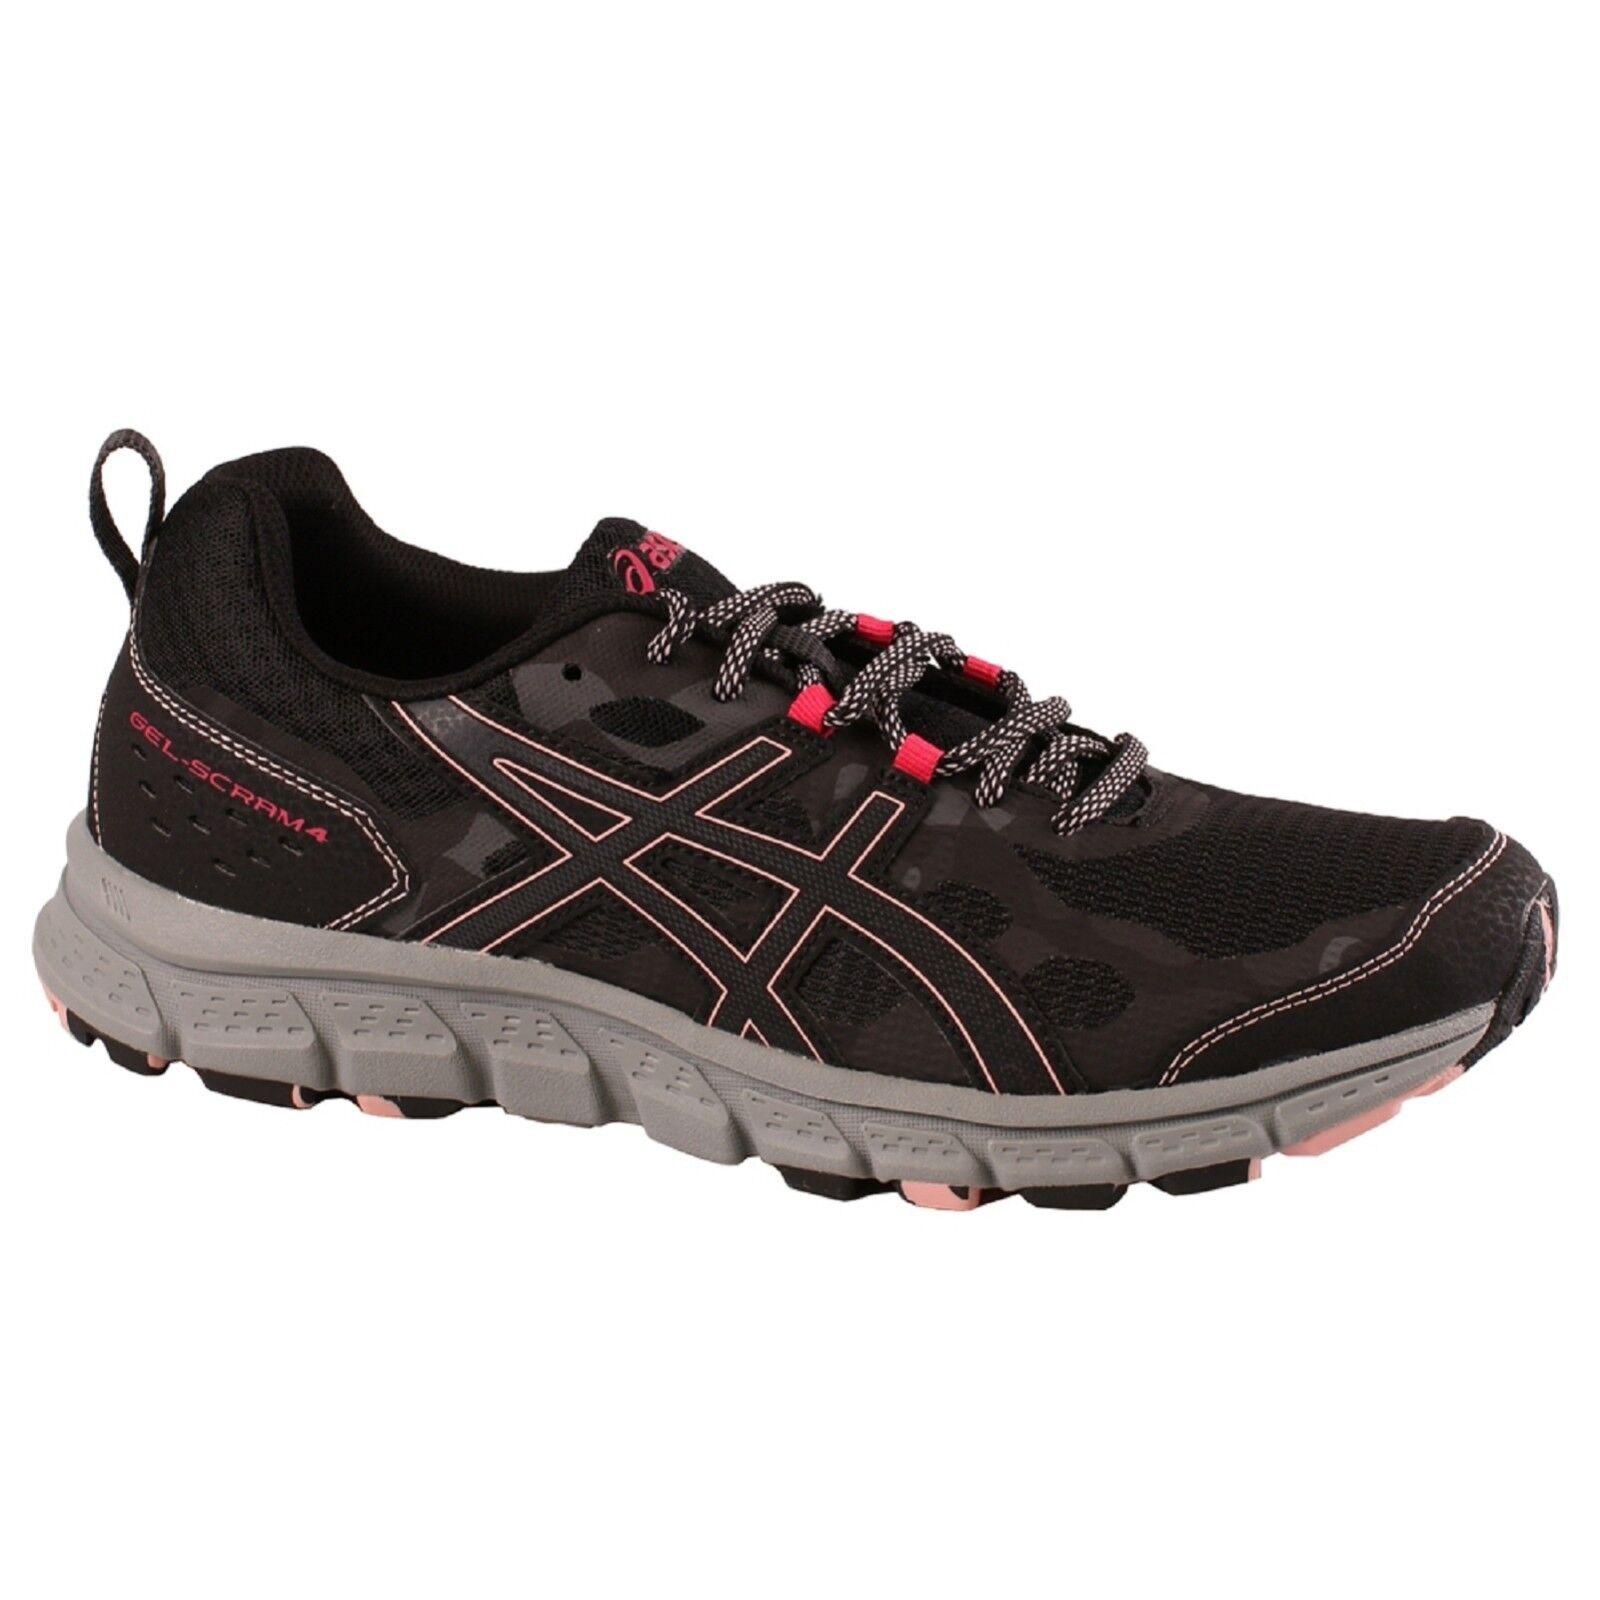 Women's Asics GEL-SCRAM 4 Price reduction 1012A170/001 Black/Dark Grey Lace-Up Running Shoes Brand discount